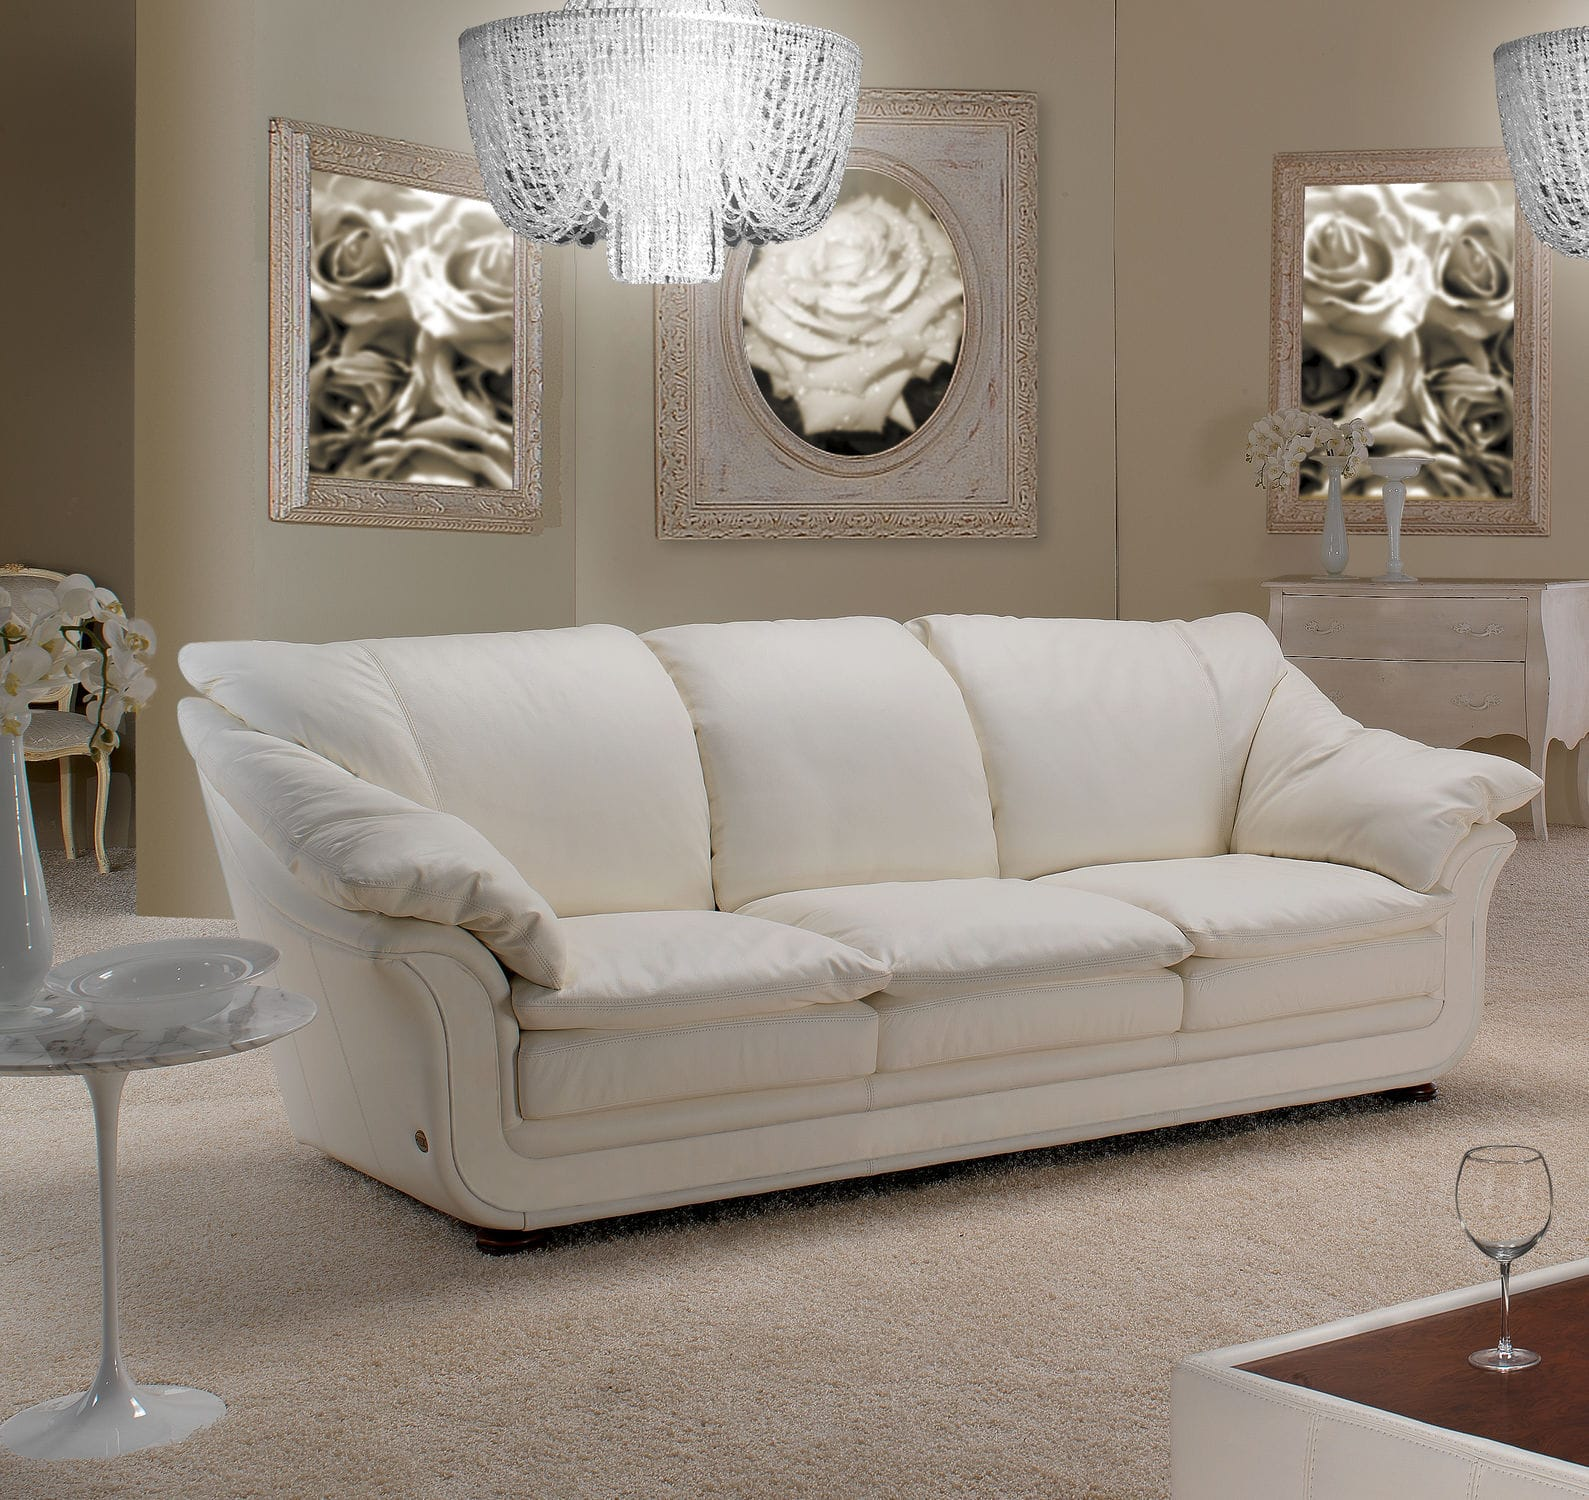 Corner sofa traditional leather fabric BENTLEY Nieri